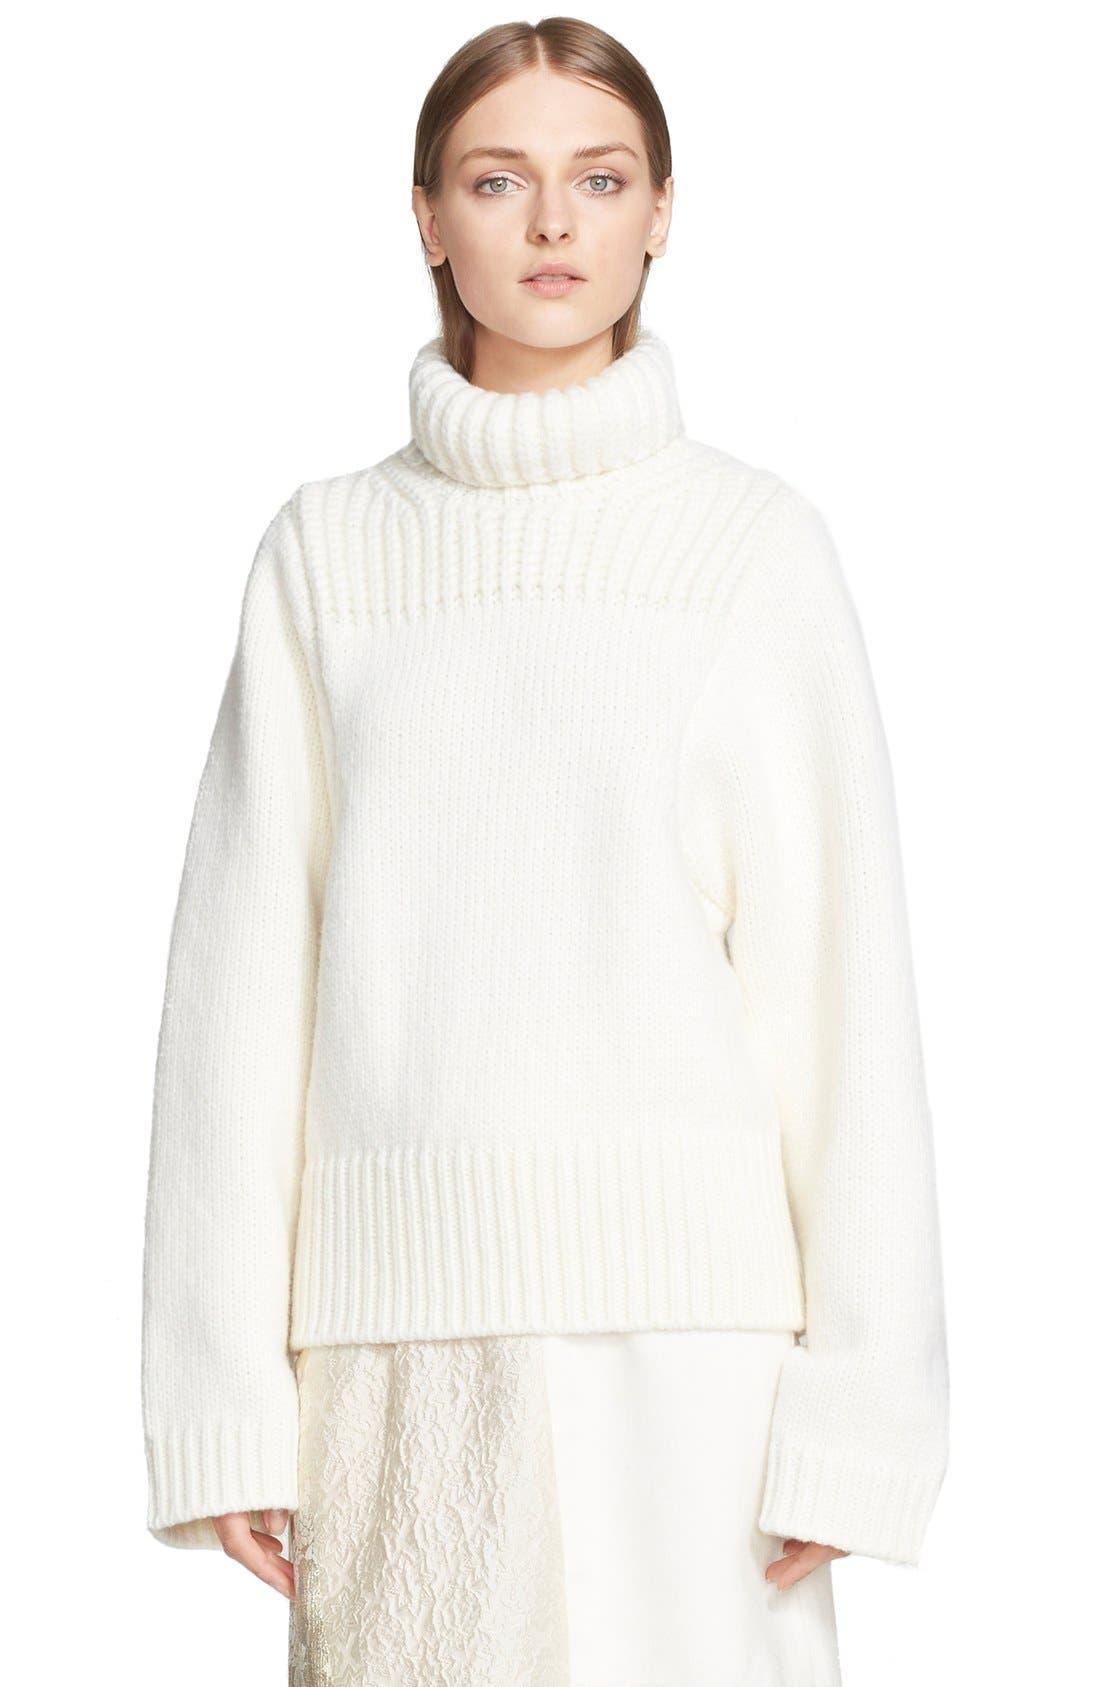 Alternate Image 1 Selected - Stella McCartney Fisherman Turtleneck Sweater